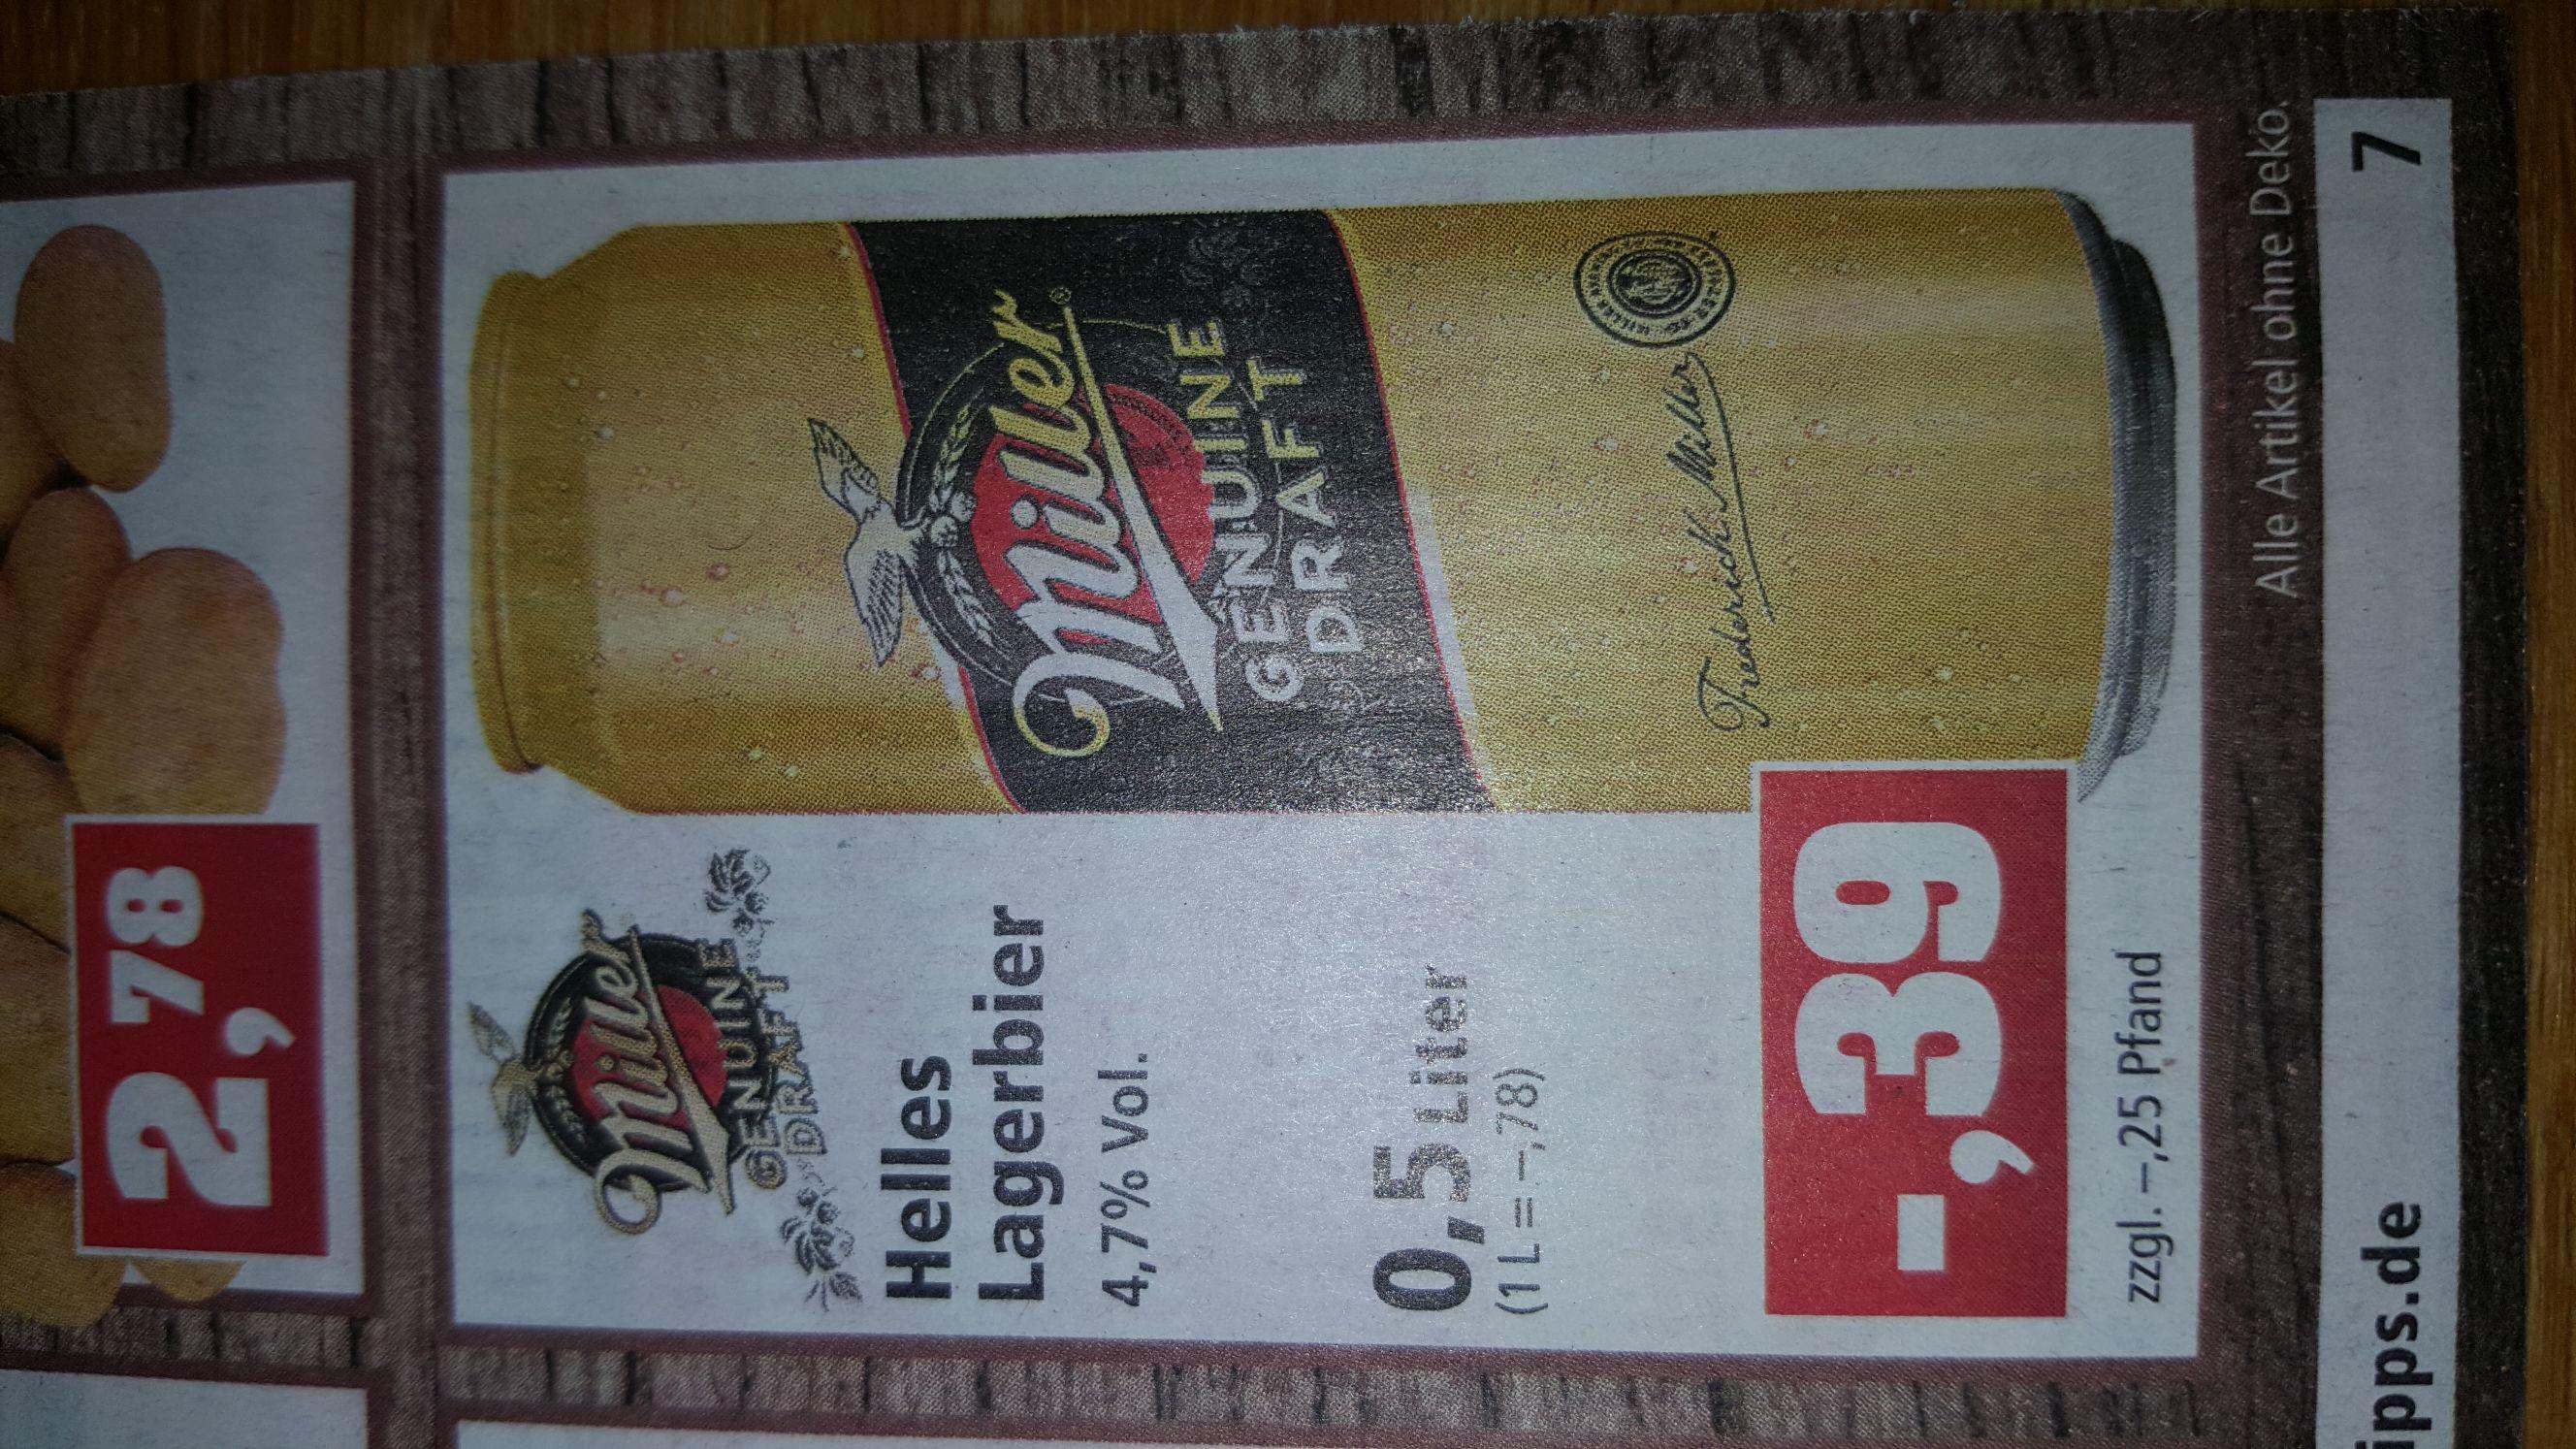 Thomas Philipps Miller Genuine Draft 0,5 Liter Dose